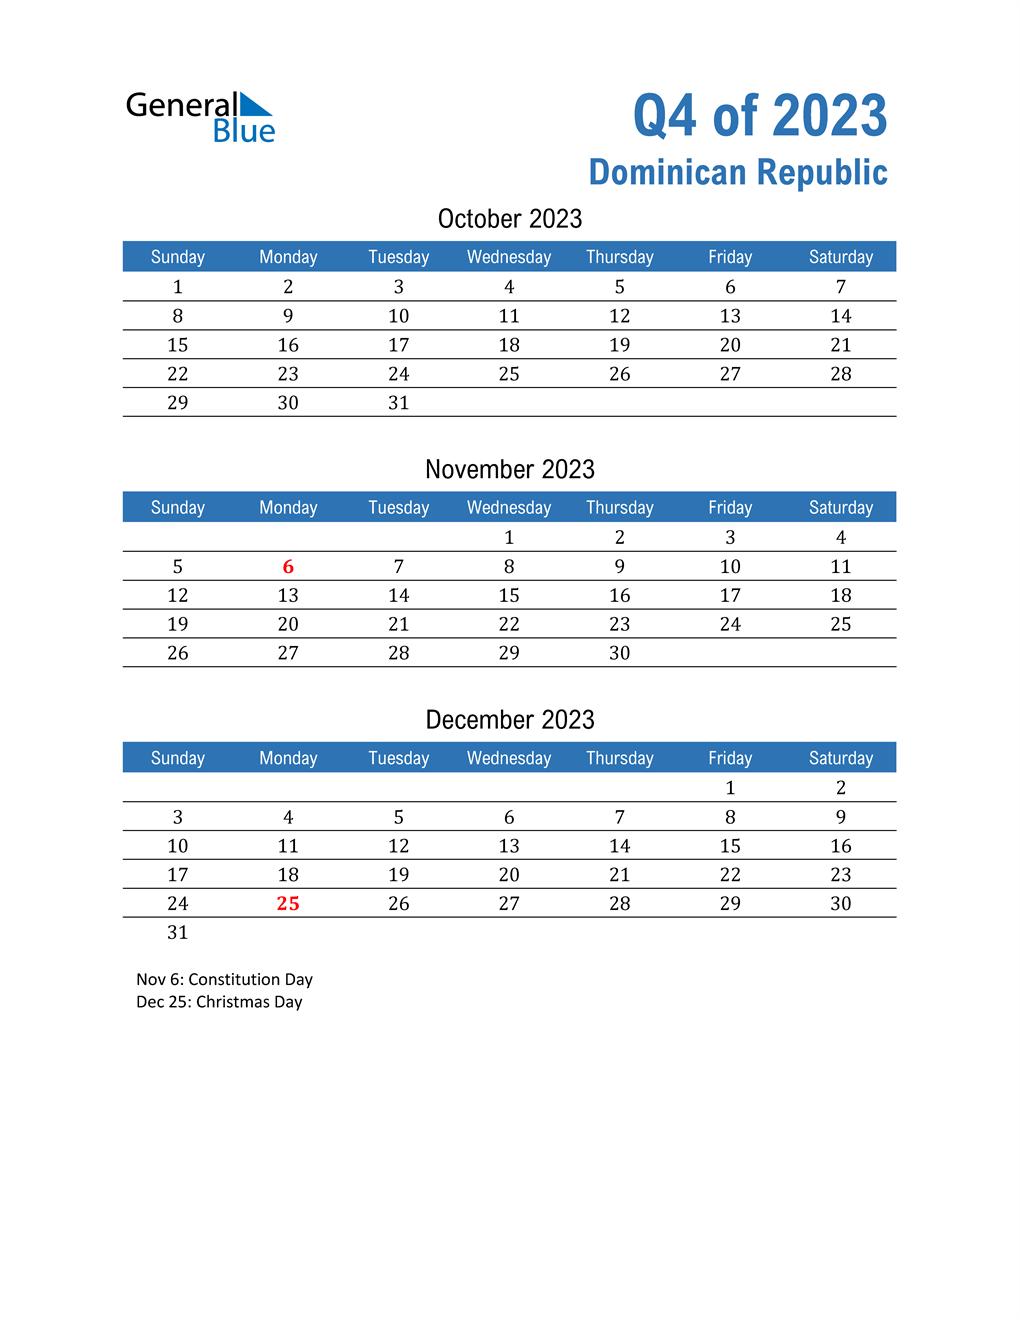 Dominican Republic 2023 Quarterly Calendar